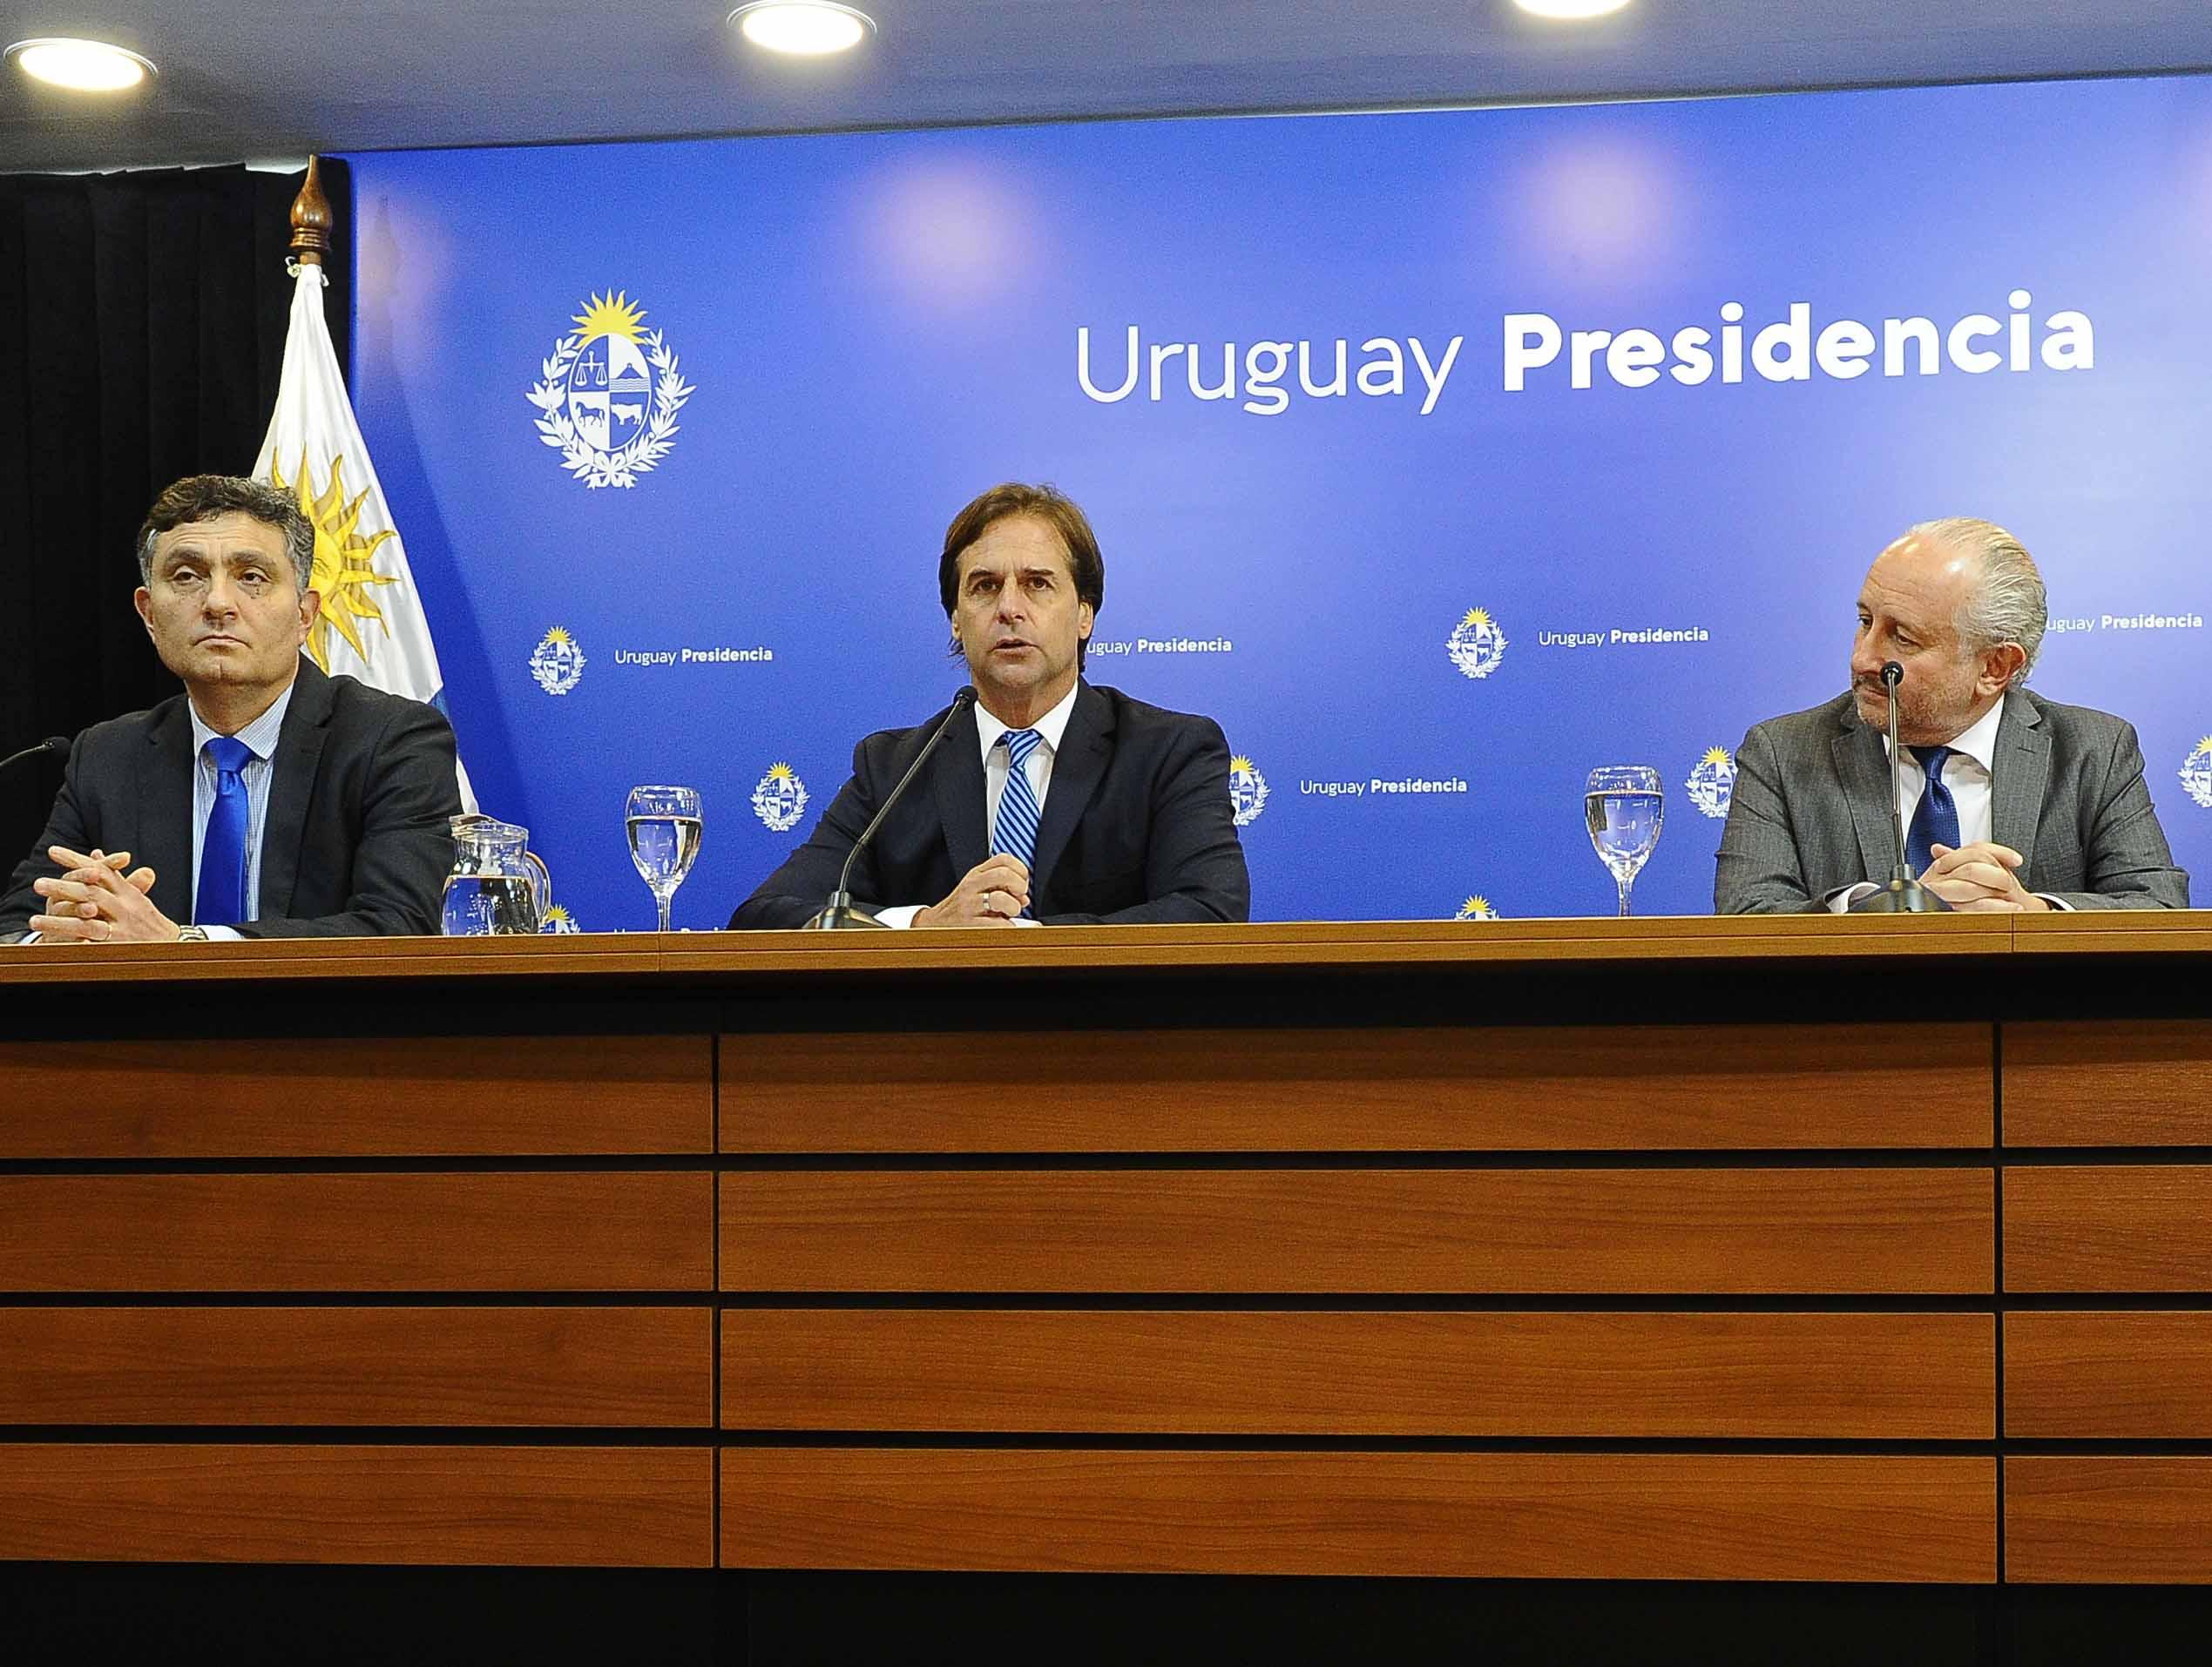 Director de OPP, Isaac Alfie, presidente, Luis Lacalle Pou, ministro de Educación, Pablo da Silveira, y ministro de Trabajo, Pablo Mieres